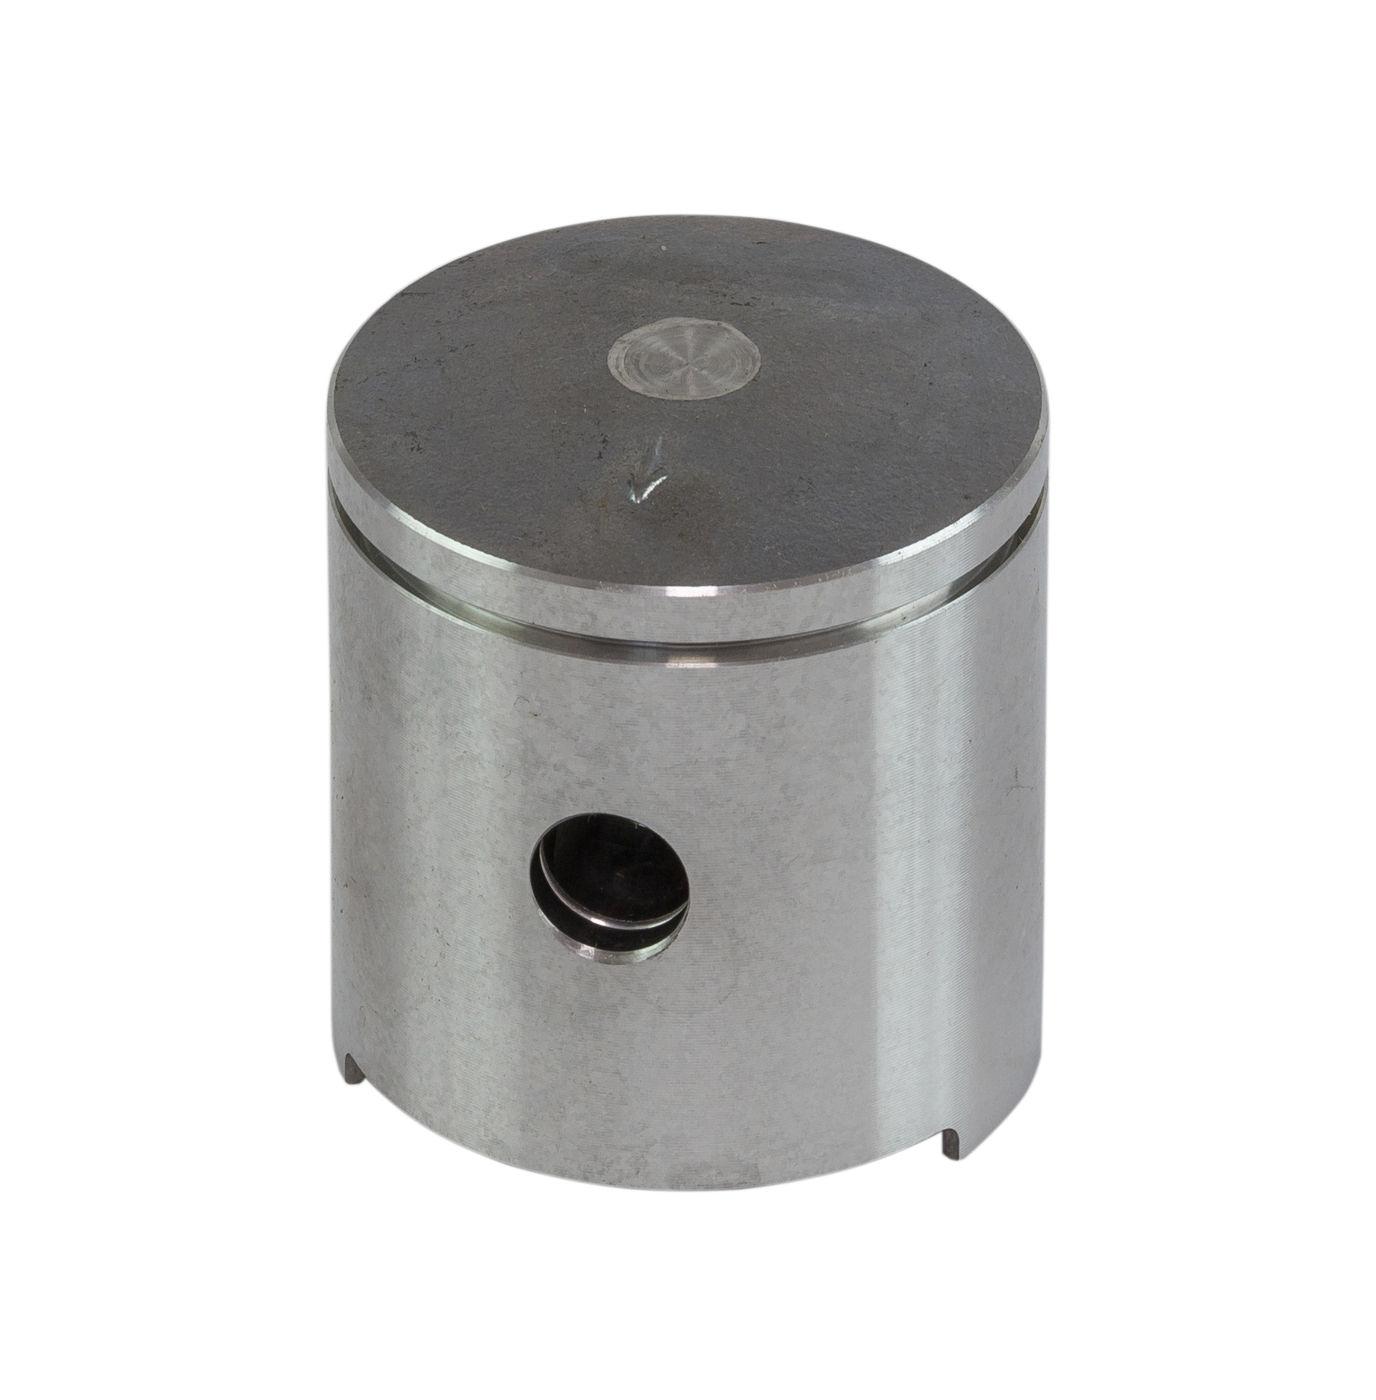 Piston Tohatsu M2.5a/3.5a/3.5b (STD) 309000011